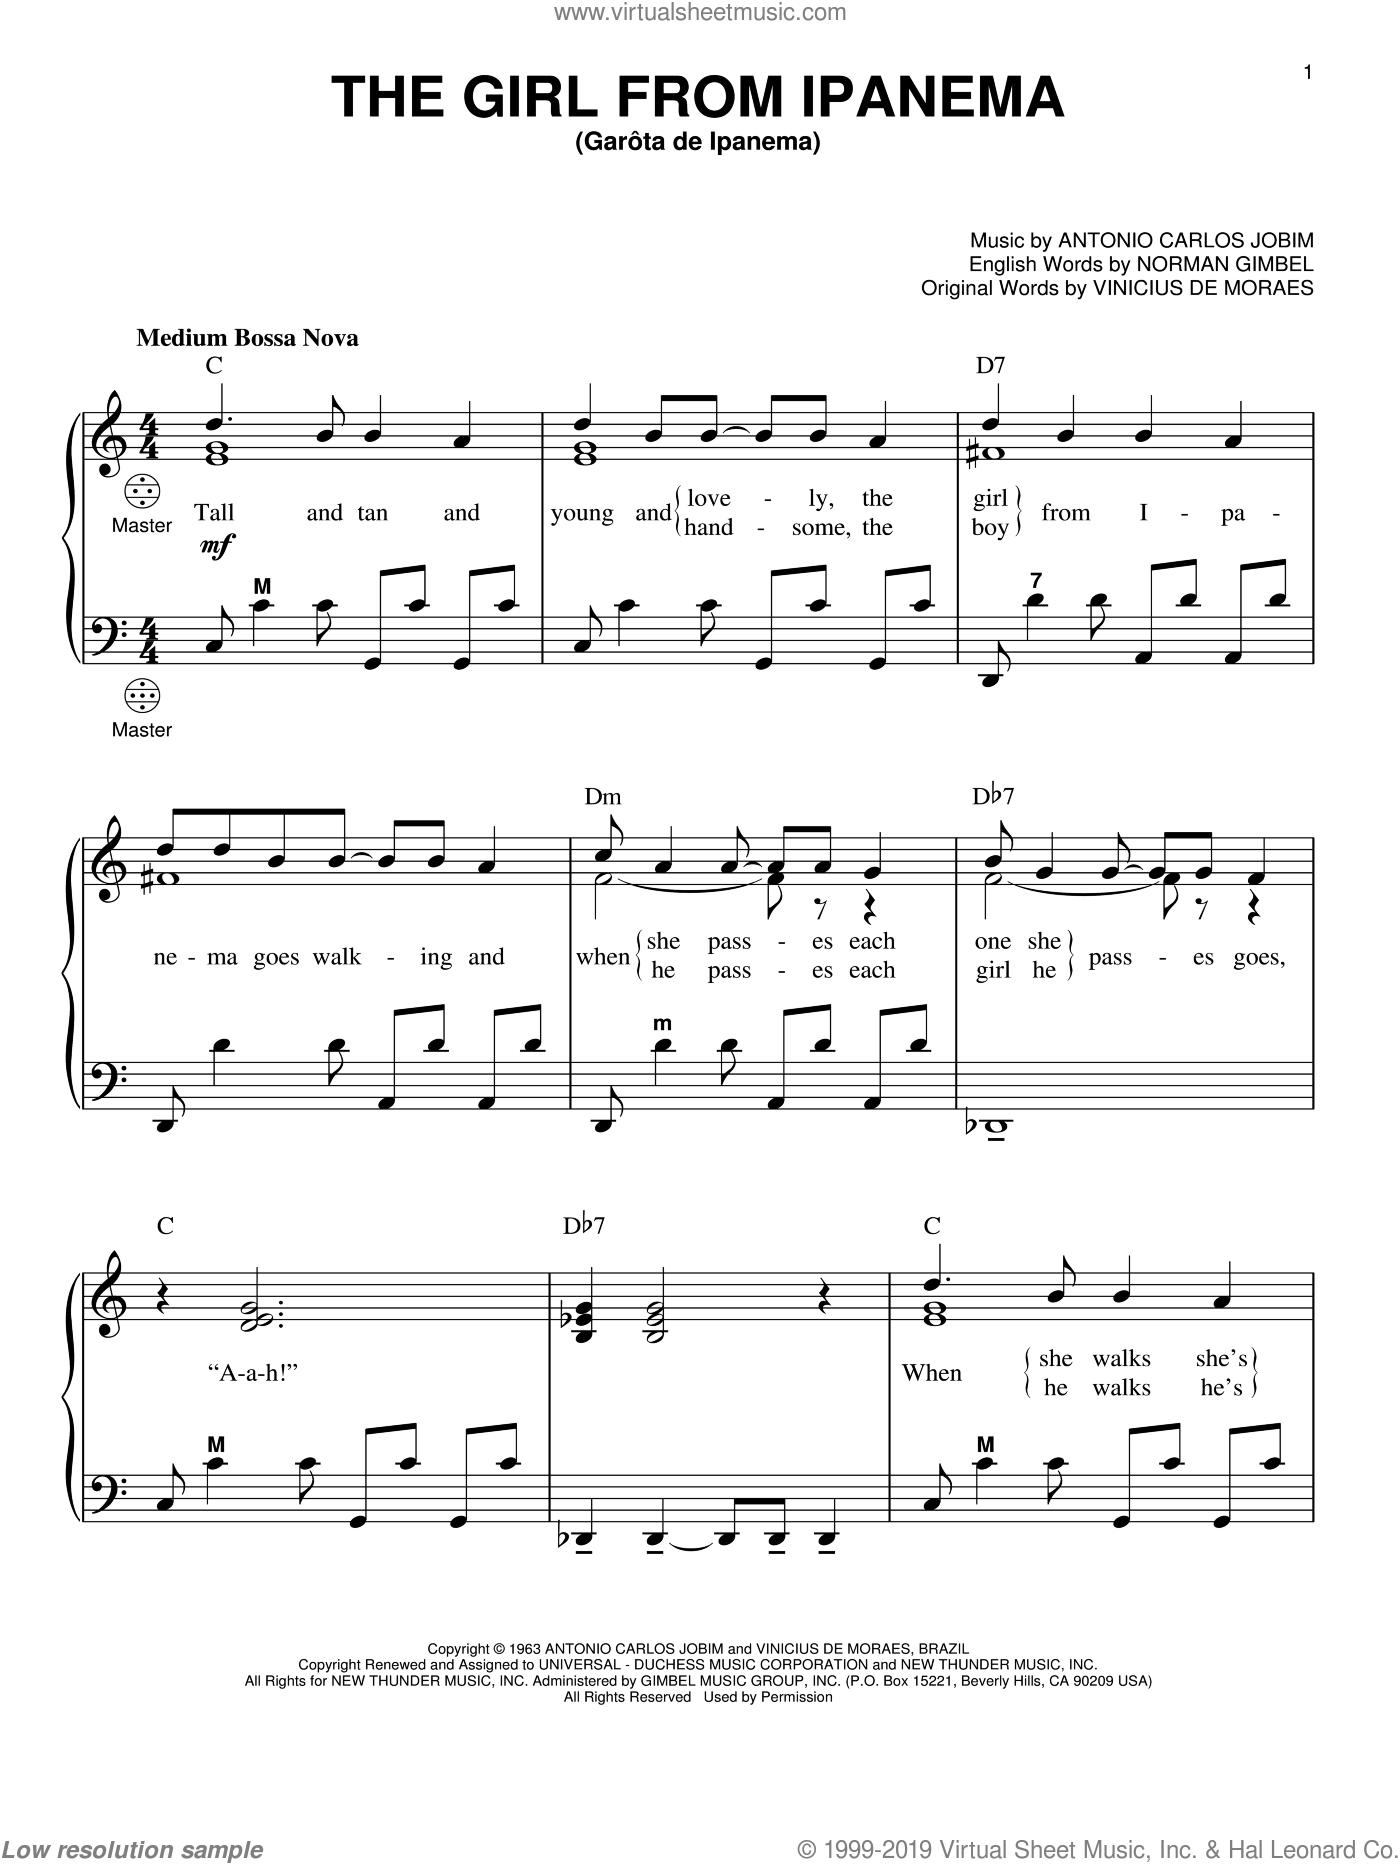 The Girl From Ipanema (Garota De Ipanema) sheet music for accordion by Antonio Carlos Jobim, Gary Meisner, Astrud Gilberto, Norman Gimbel and Vinicius de Moraes, intermediate skill level